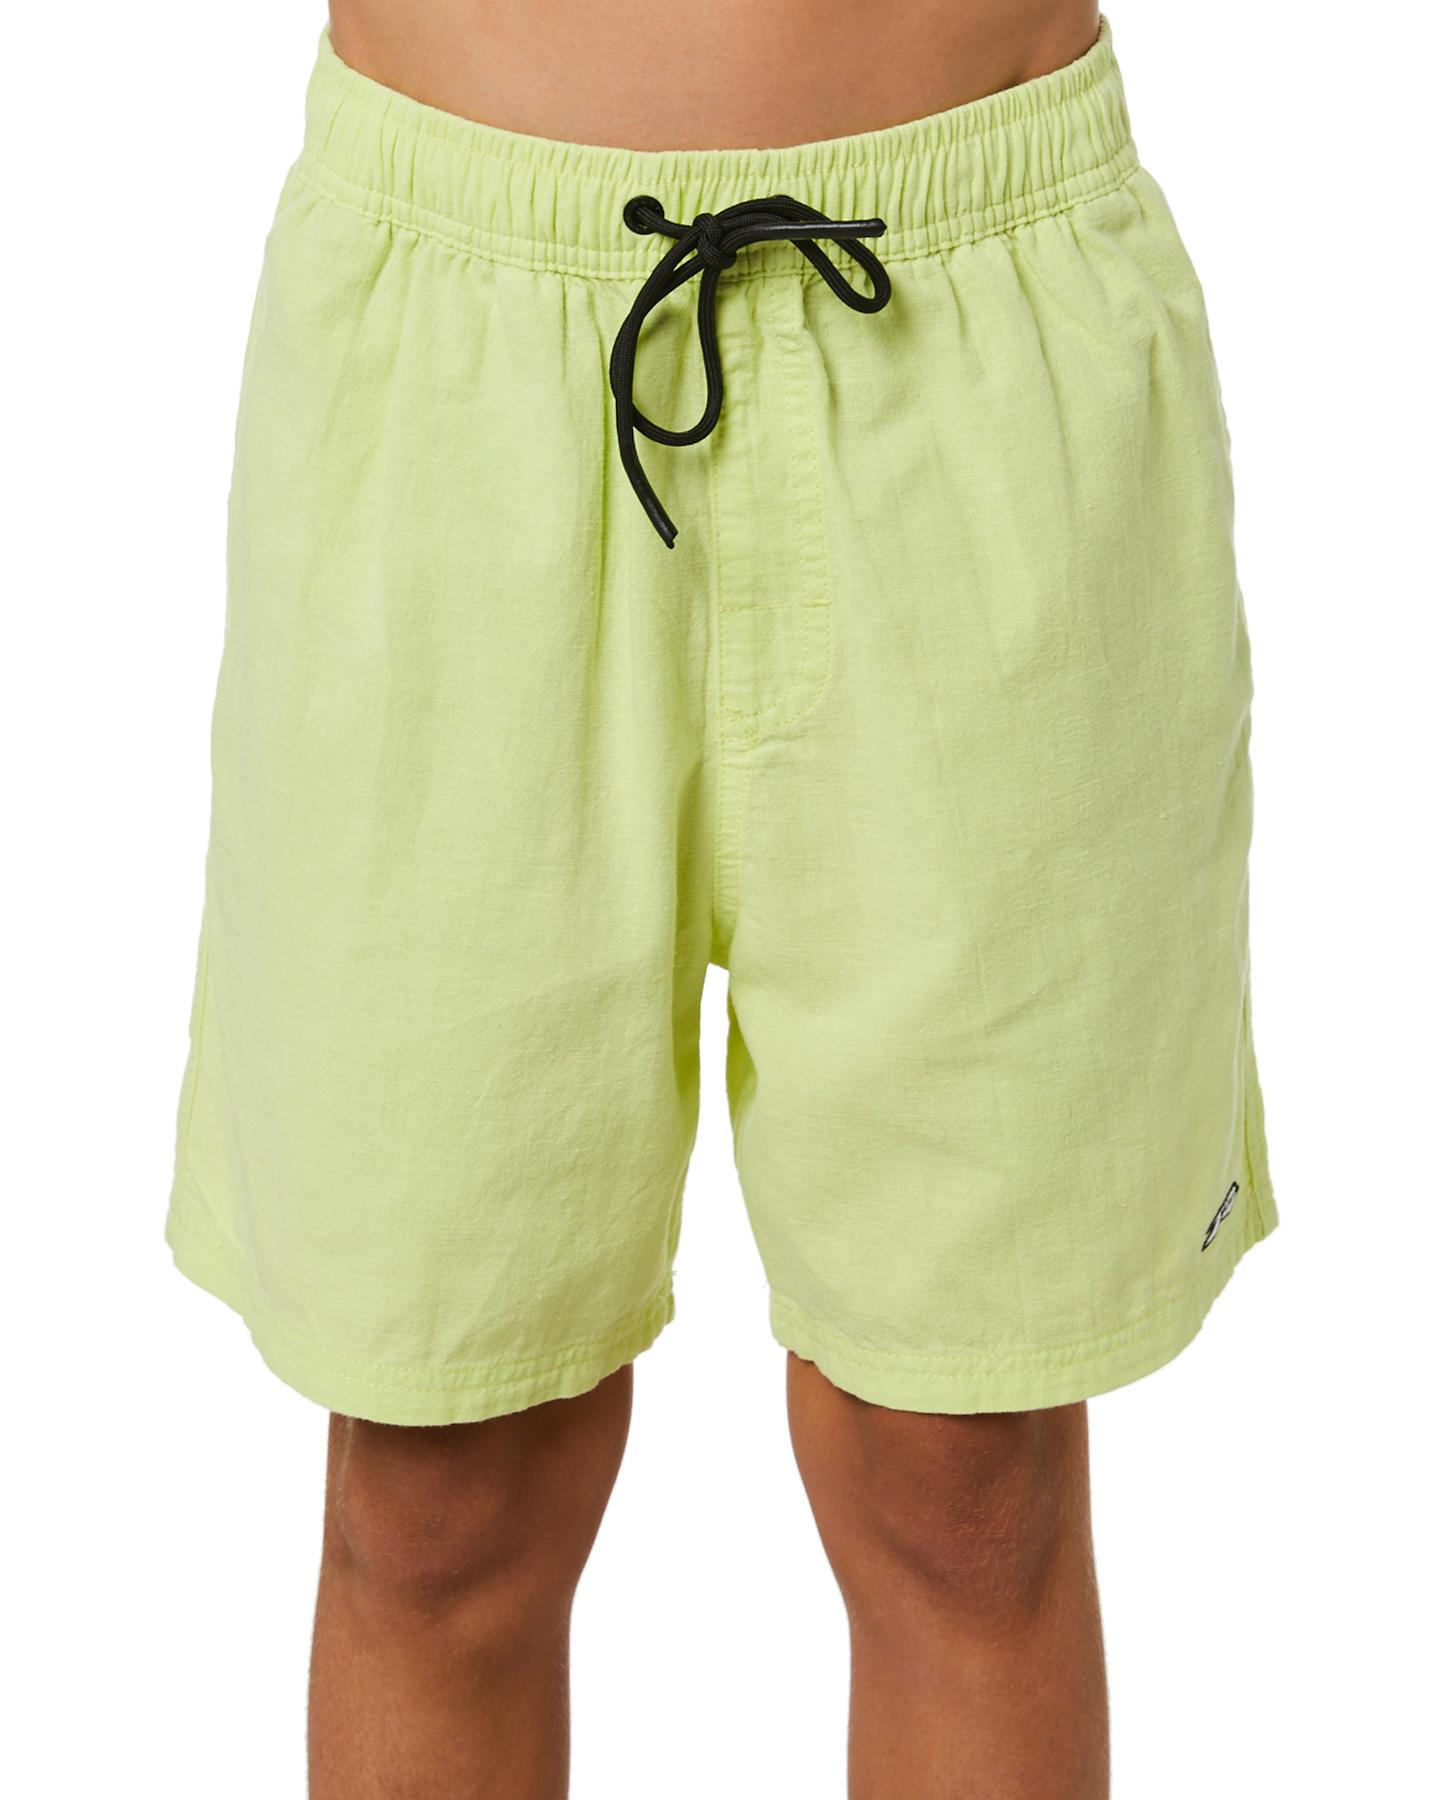 Rusty Boys Undertone Elastic Linen  Short - Teen Pale Banana Pale Banana